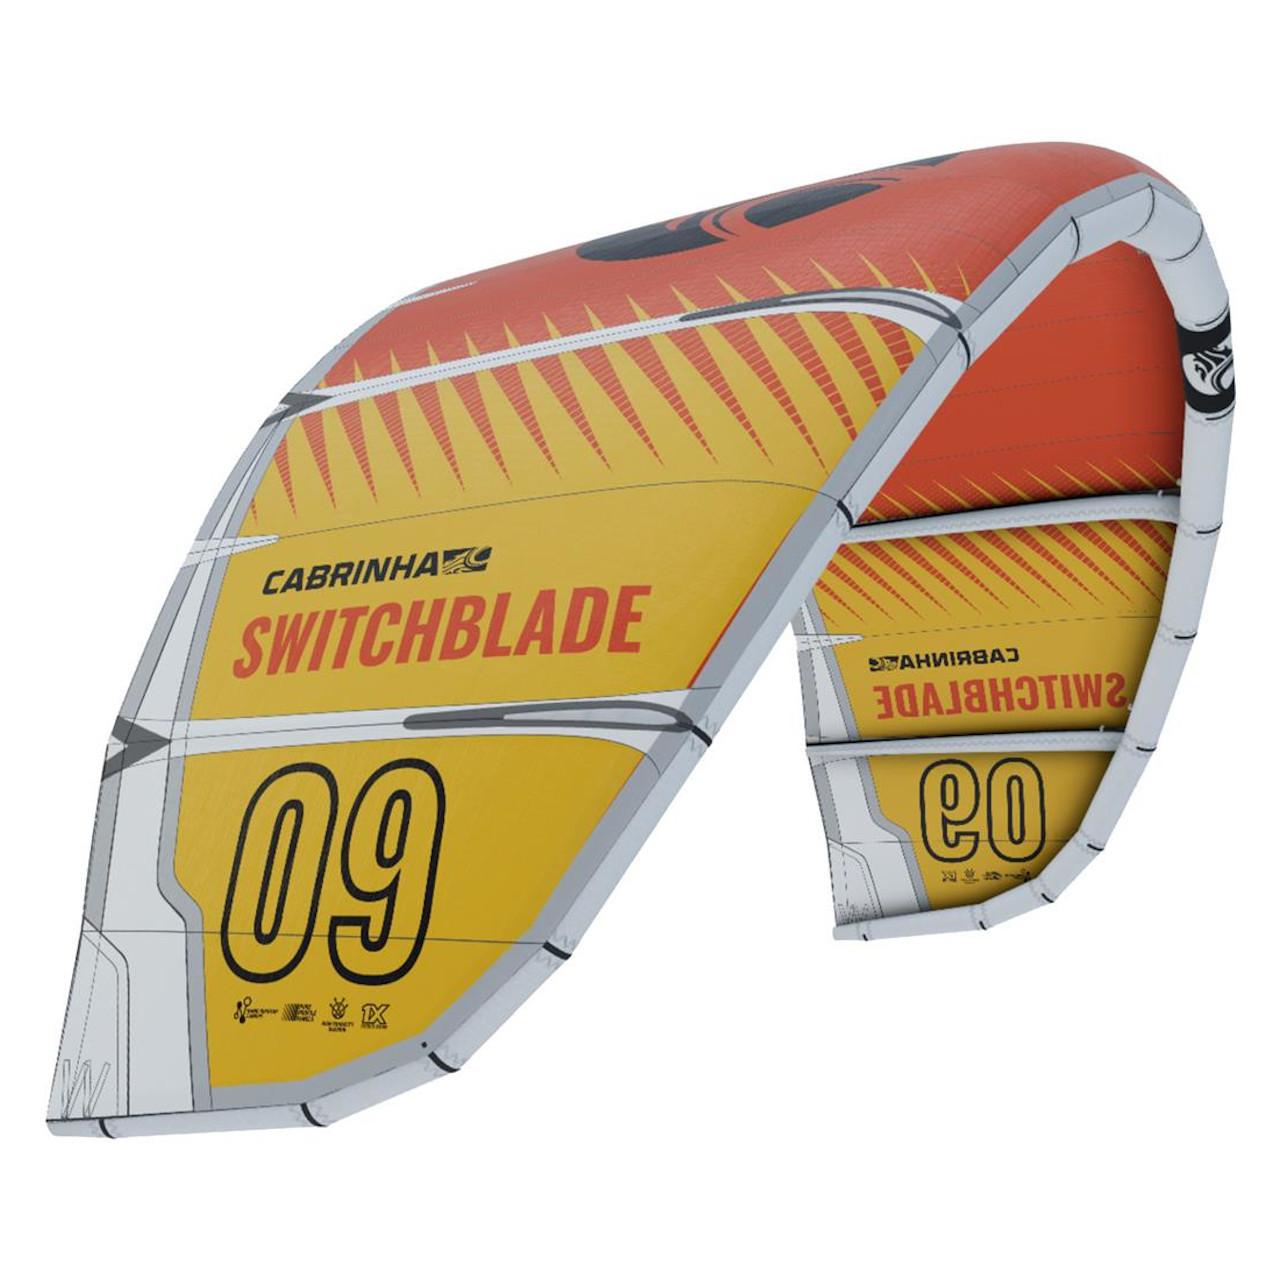 2021 Cabrinha Switchblade - Yellow/Red